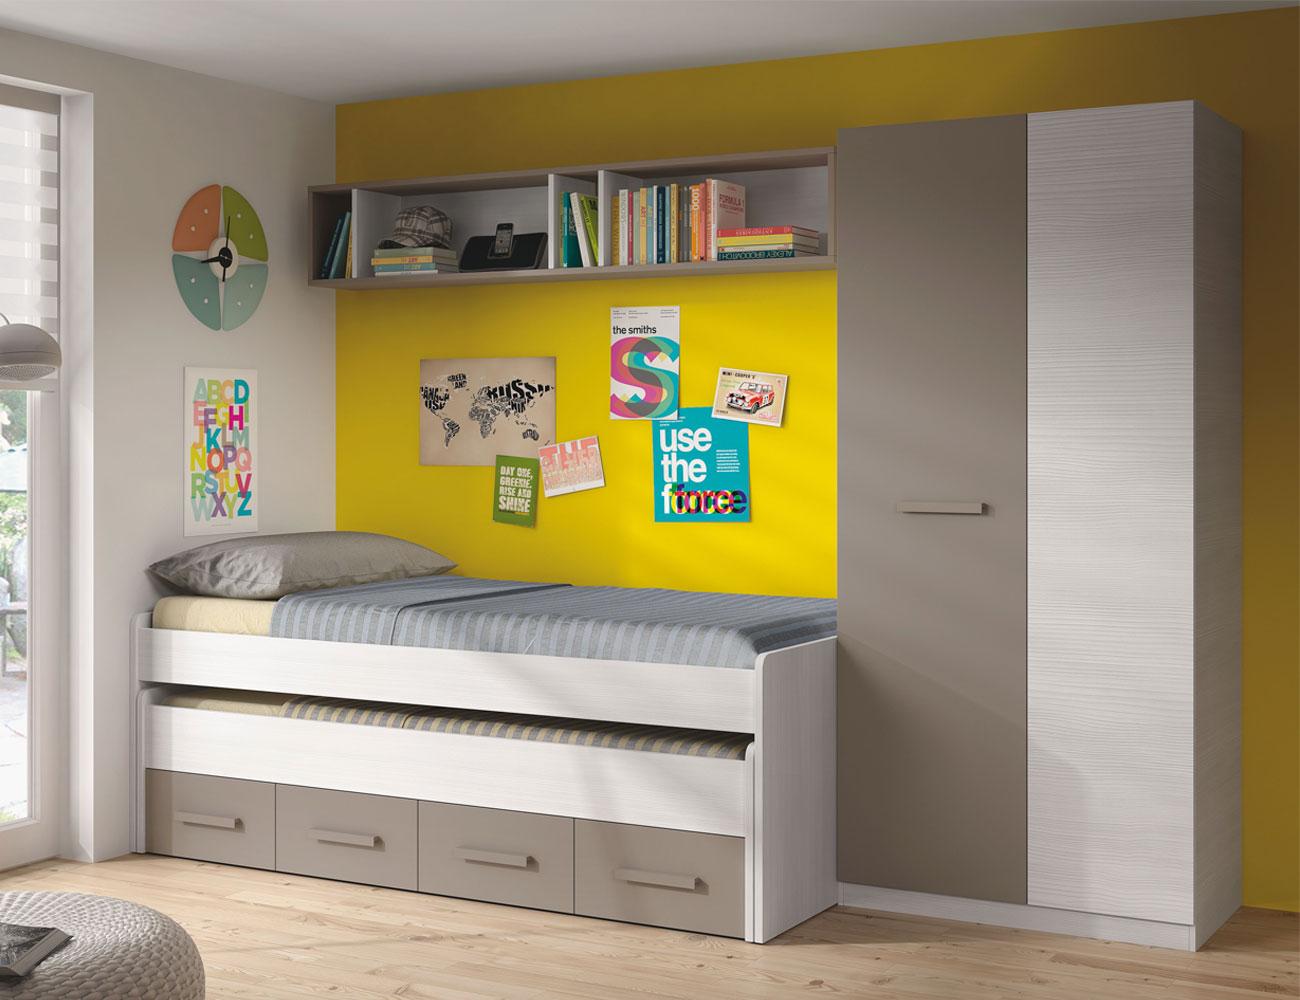 Dormitorio juvenil cama nido armario basalto1